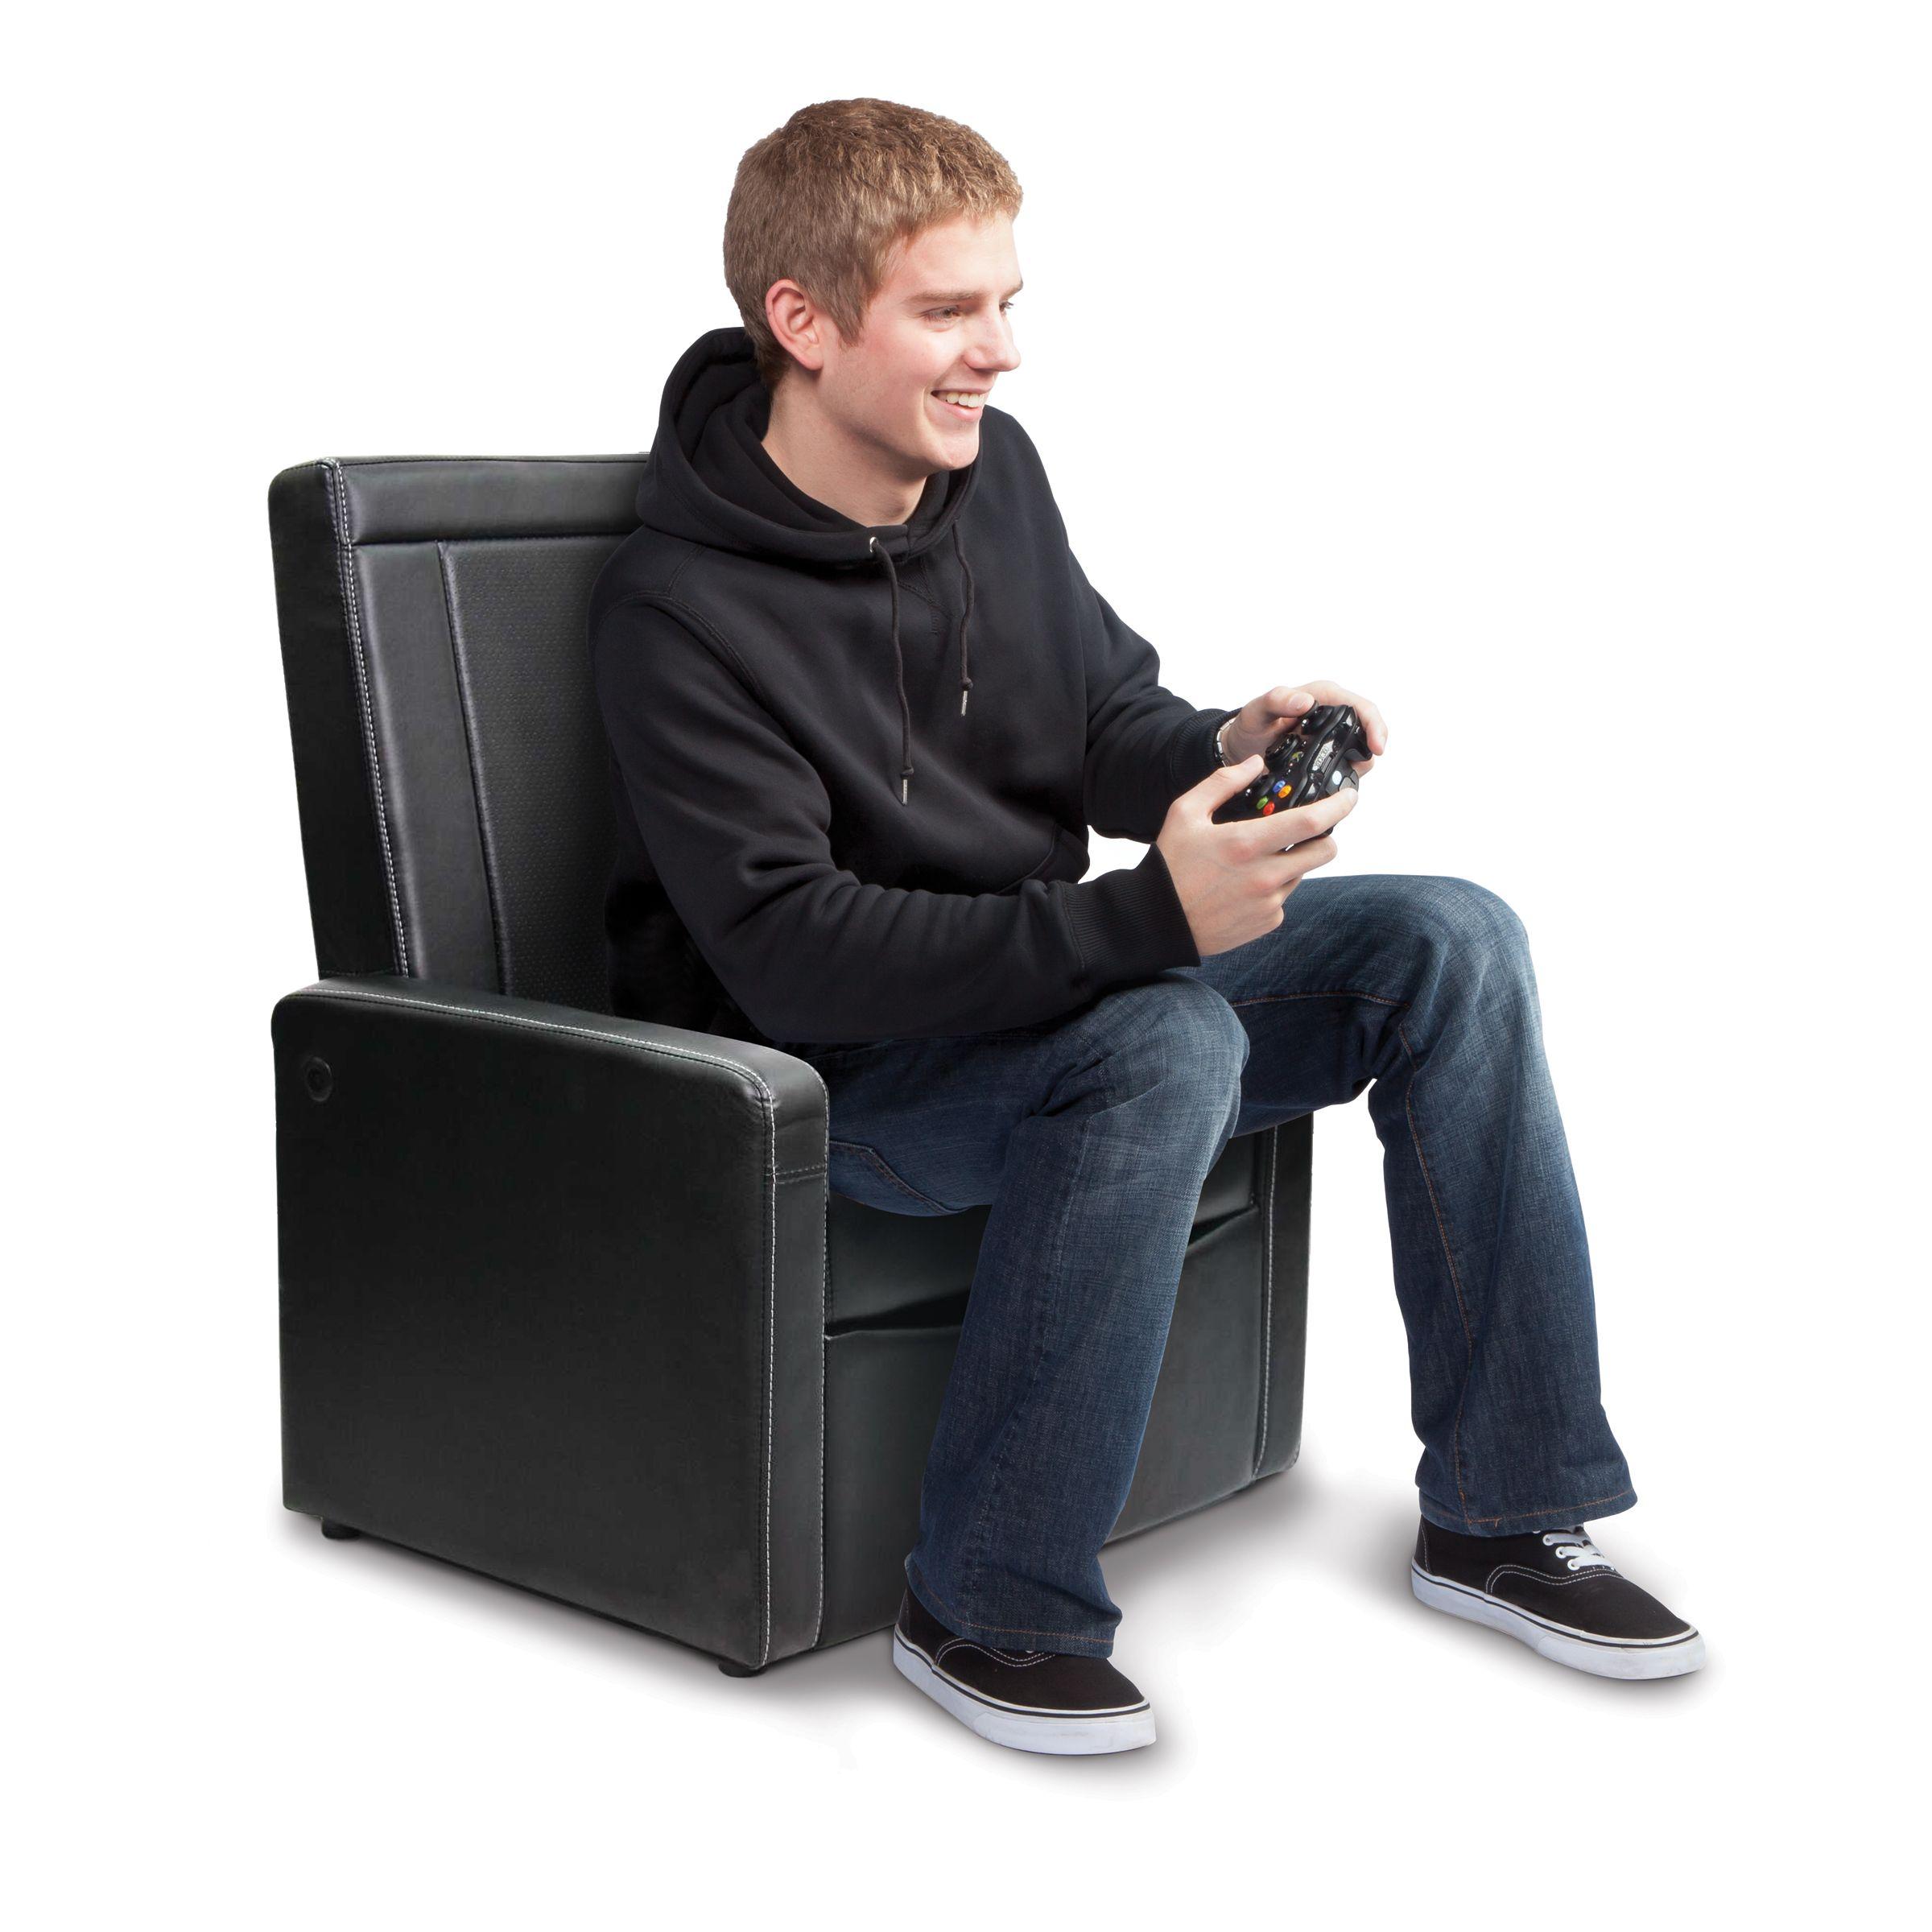 Gaming Chair/ Ottoman Available at Walmart New Gaming